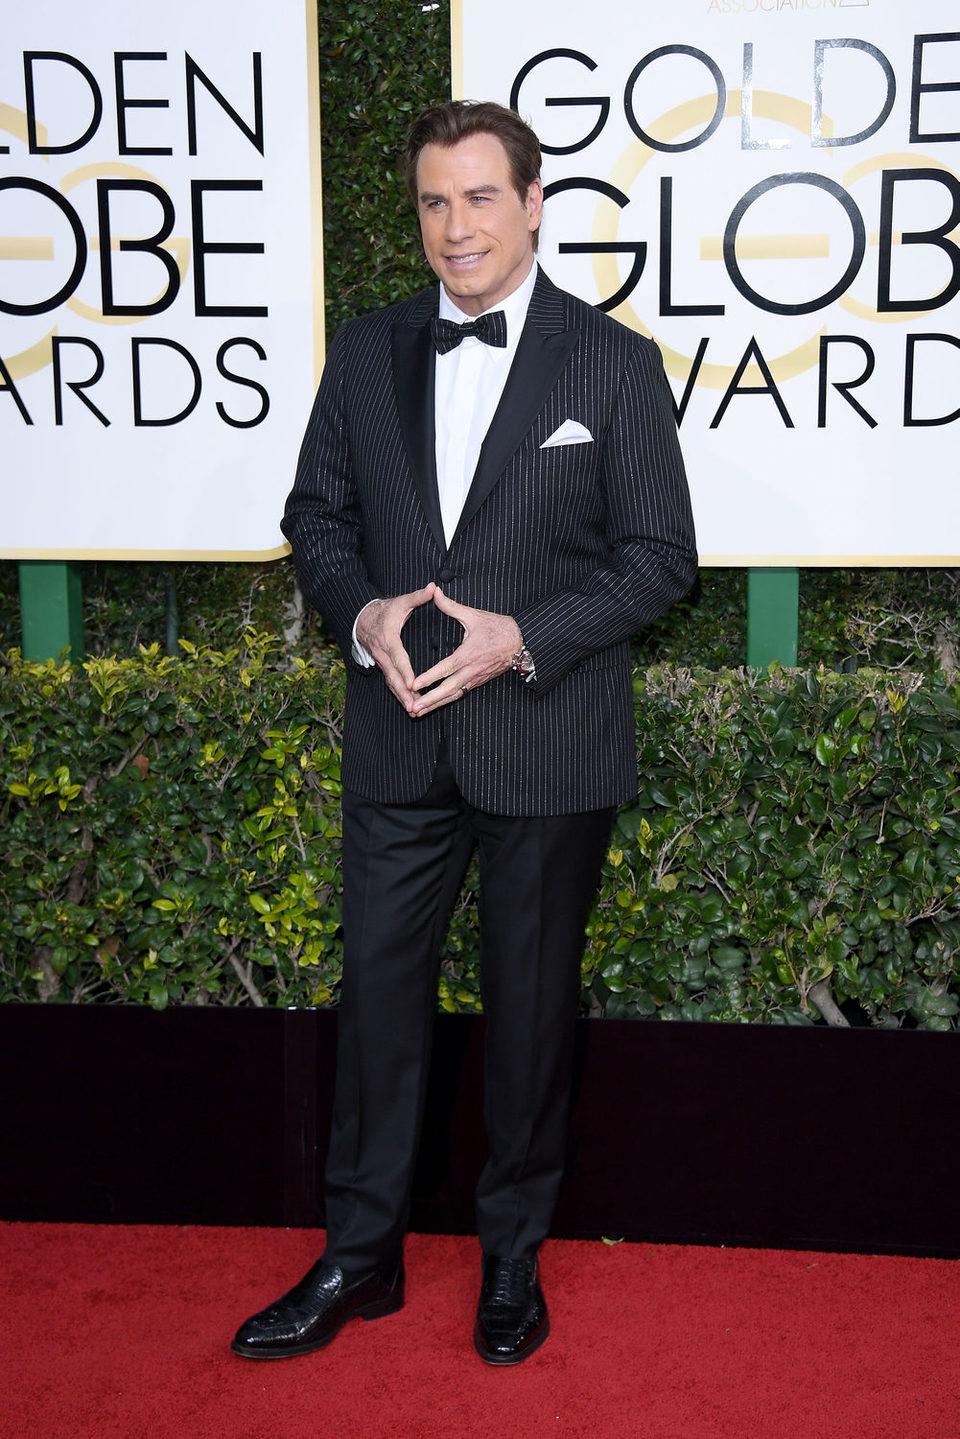 John Travolta at the 2017 Golden Globes red carpet